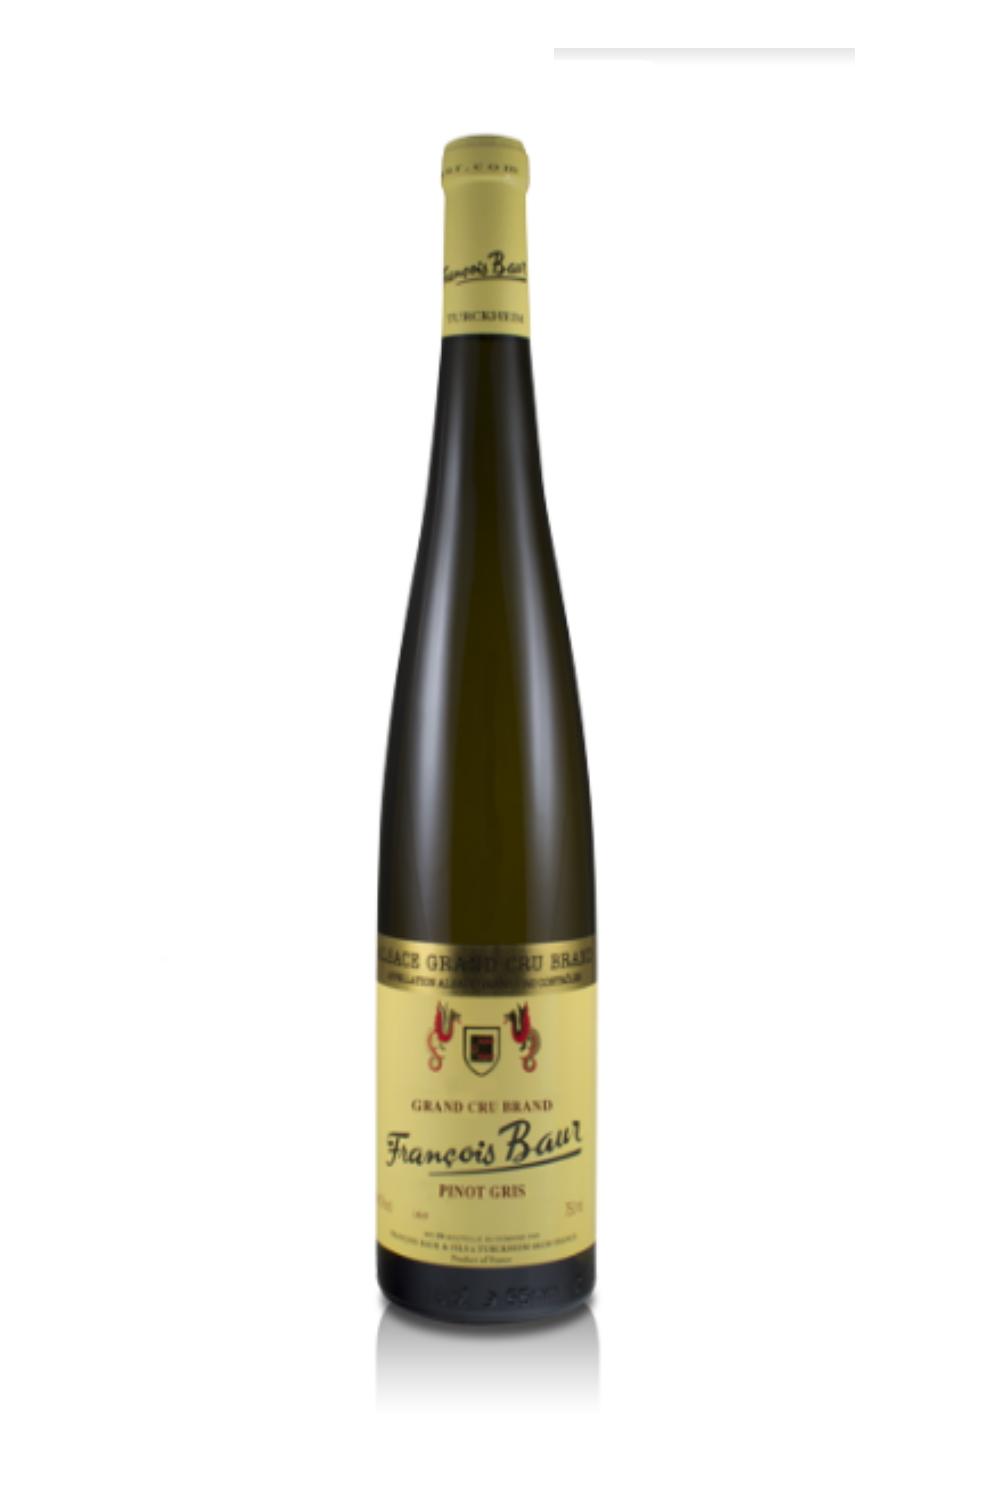 Pinot Gris Grand Cru Brand- François Baur -Lalsace- en-Bouteille -turckheim- bio